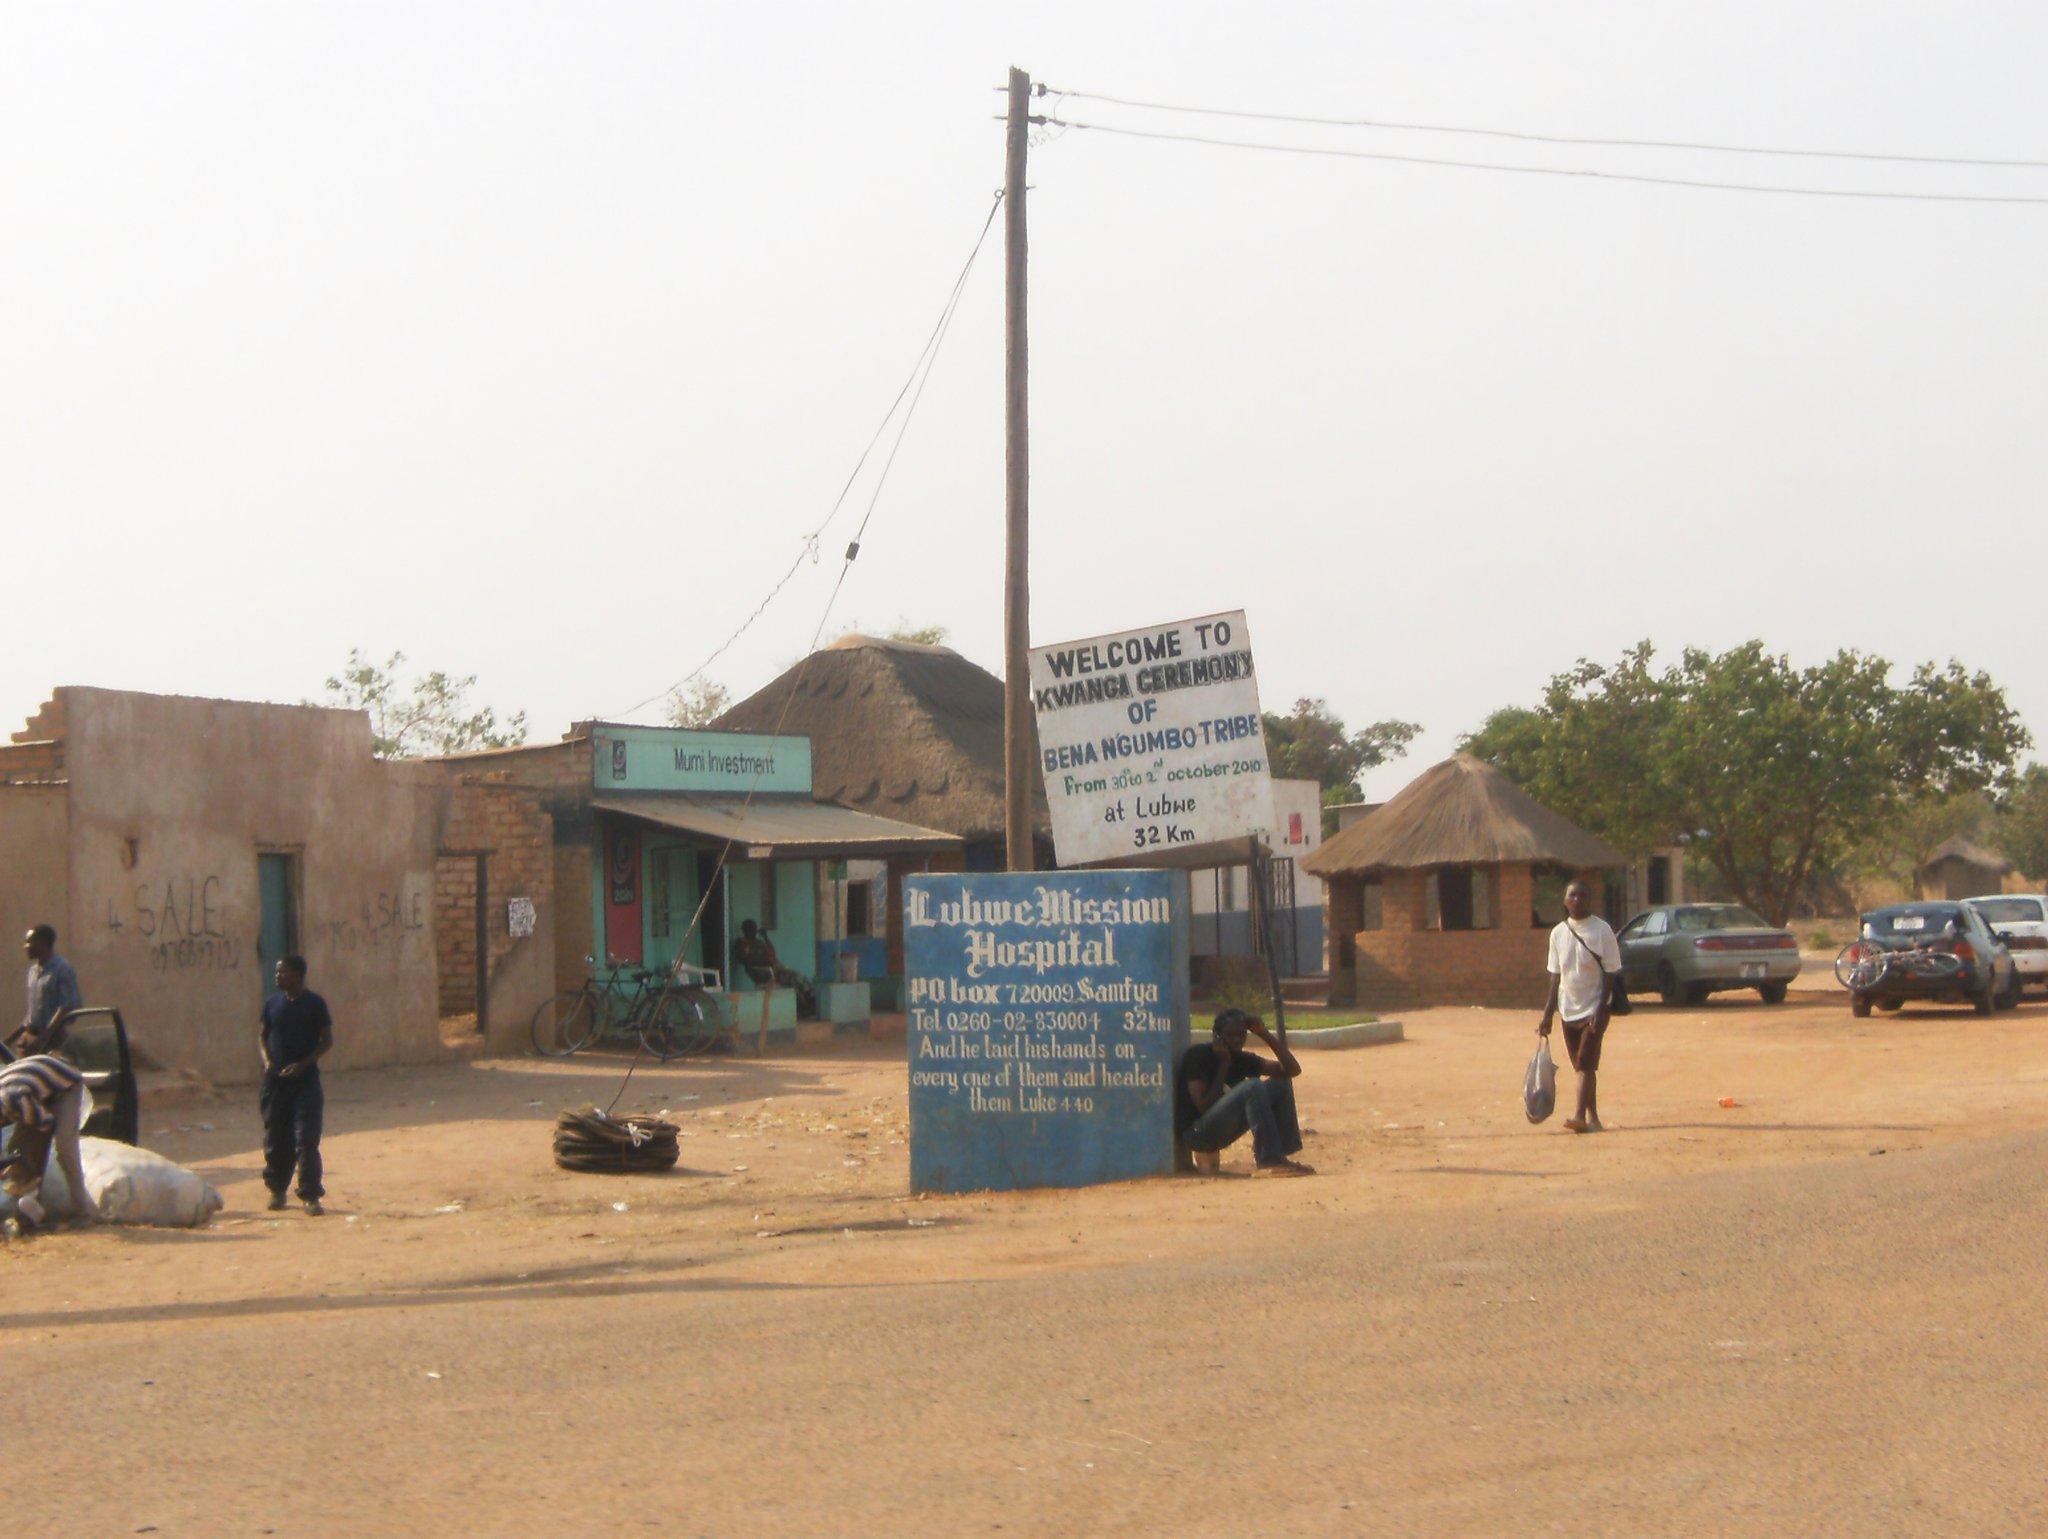 lubwe-mission-hospital